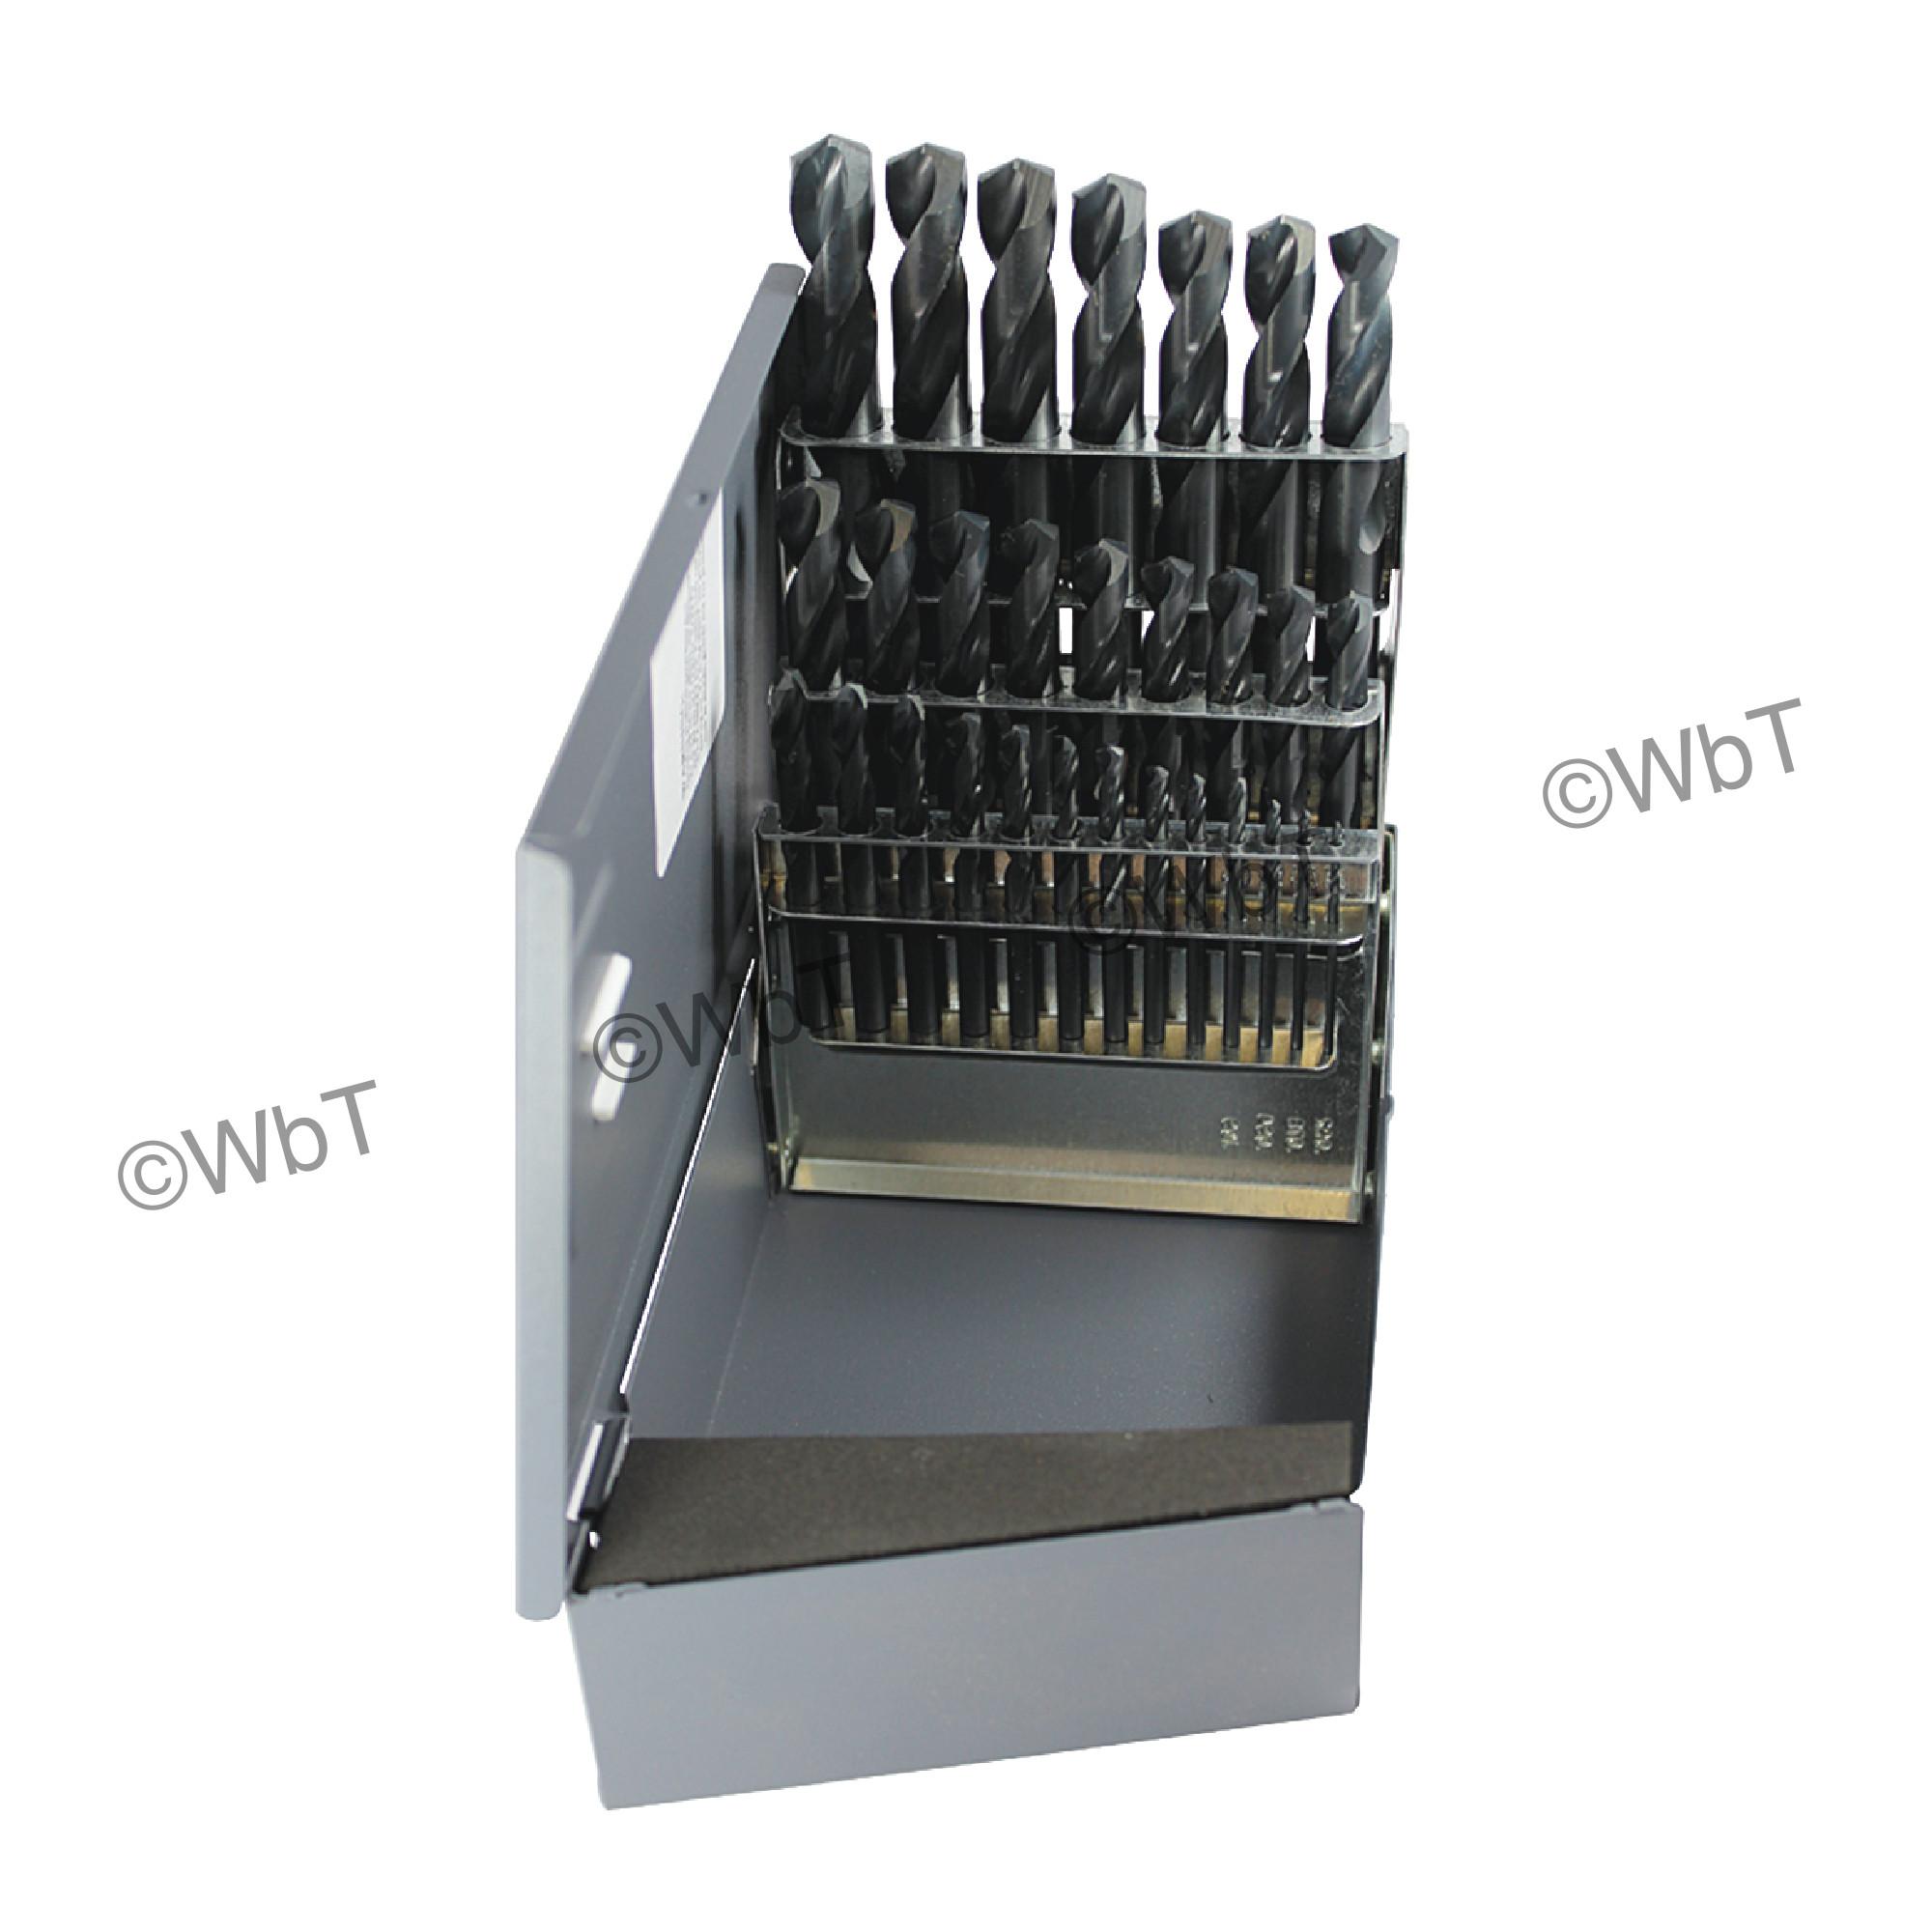 RM29B HSS 1/16-1/2 135 STUB DRILL SET-RUSHMORE